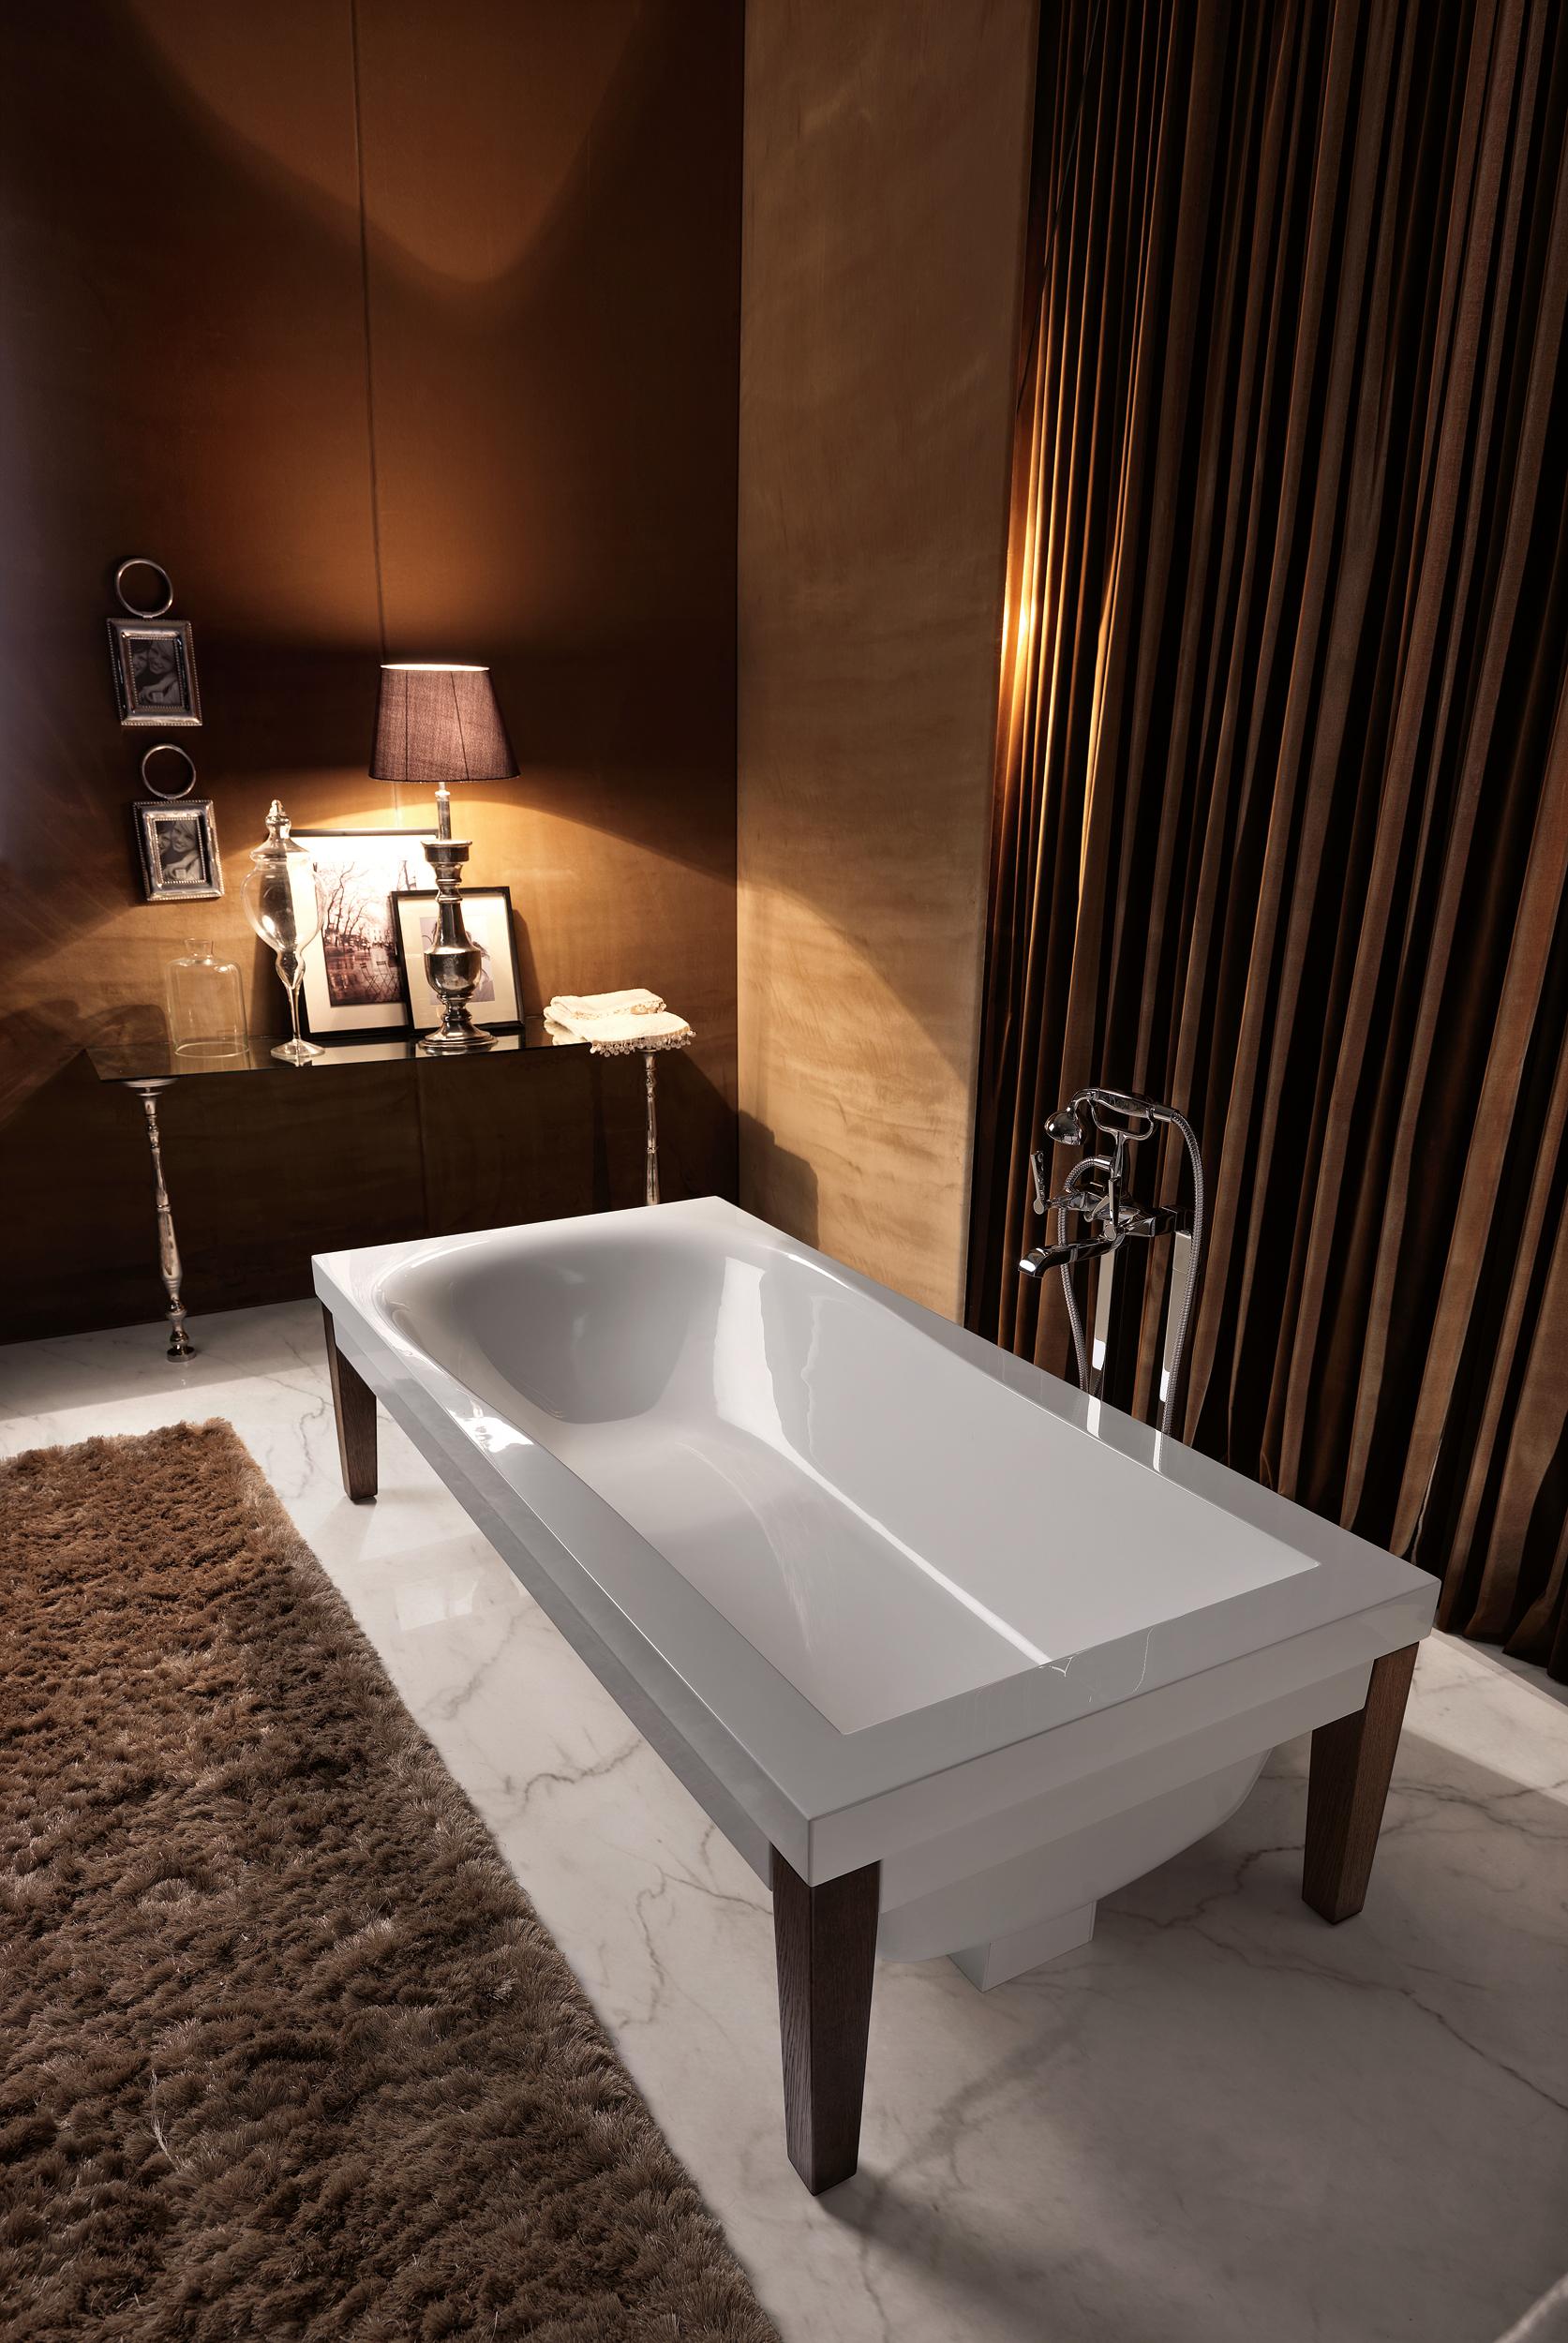 Vasca con gambe in frassino scuro - Vasca da bagno con gambe ...